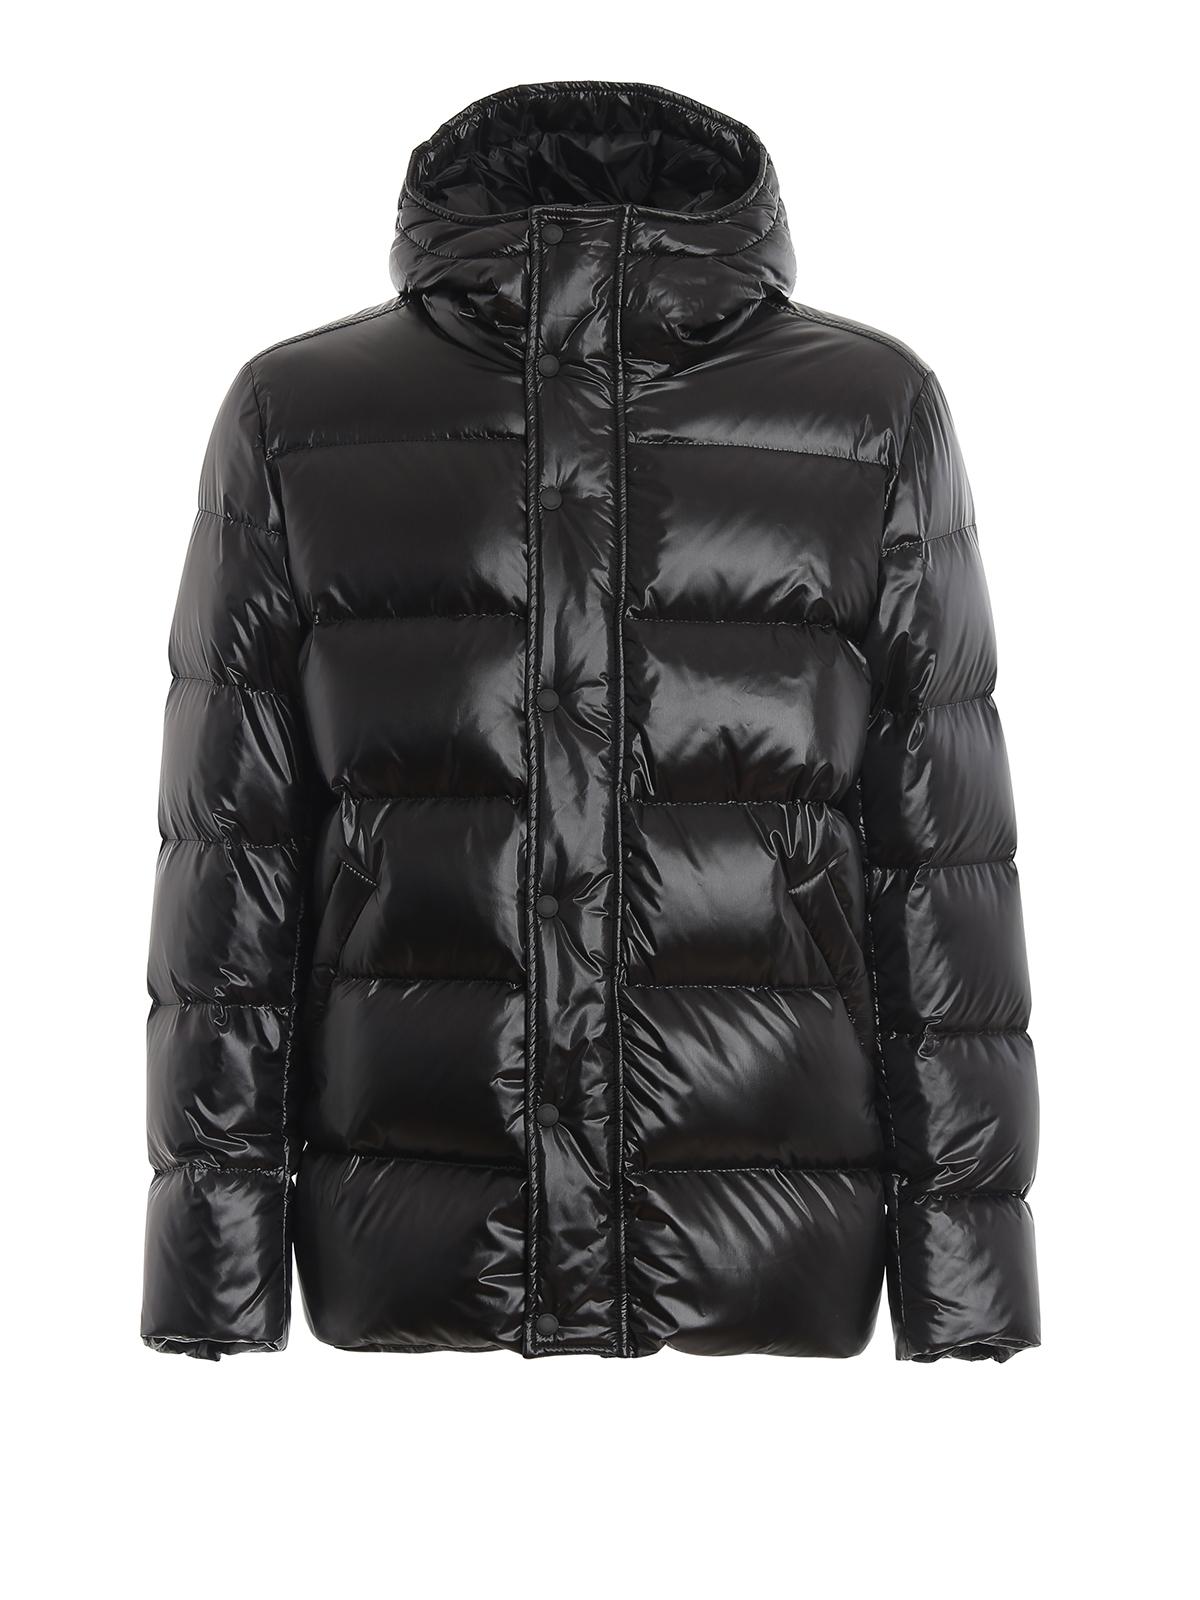 Hogan Rubber Logo Patch Black Puffer Jacket